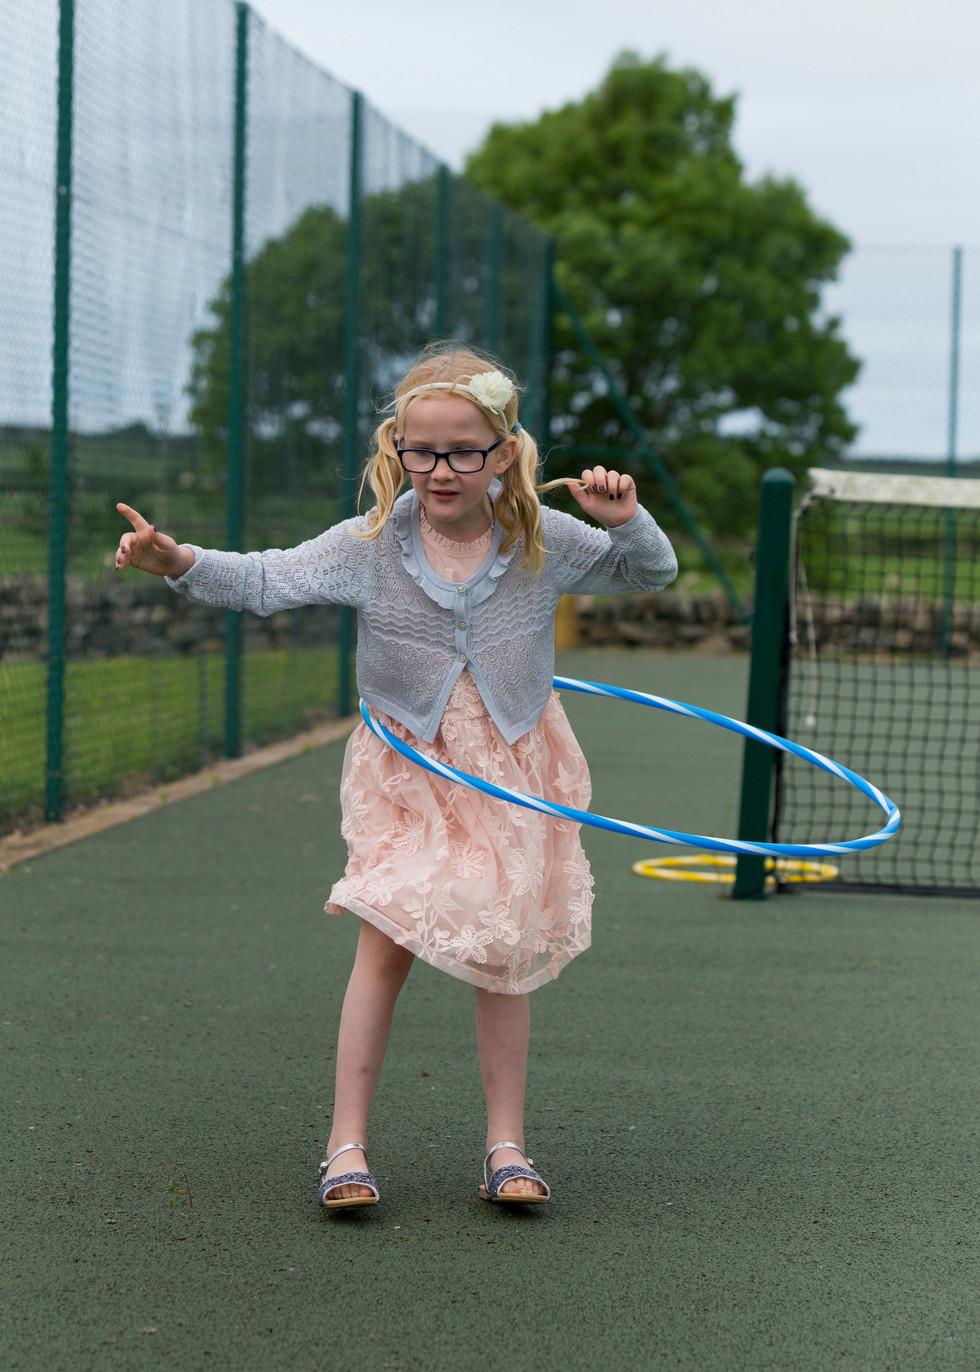 Kid's Entertainment Christa Emily Photography